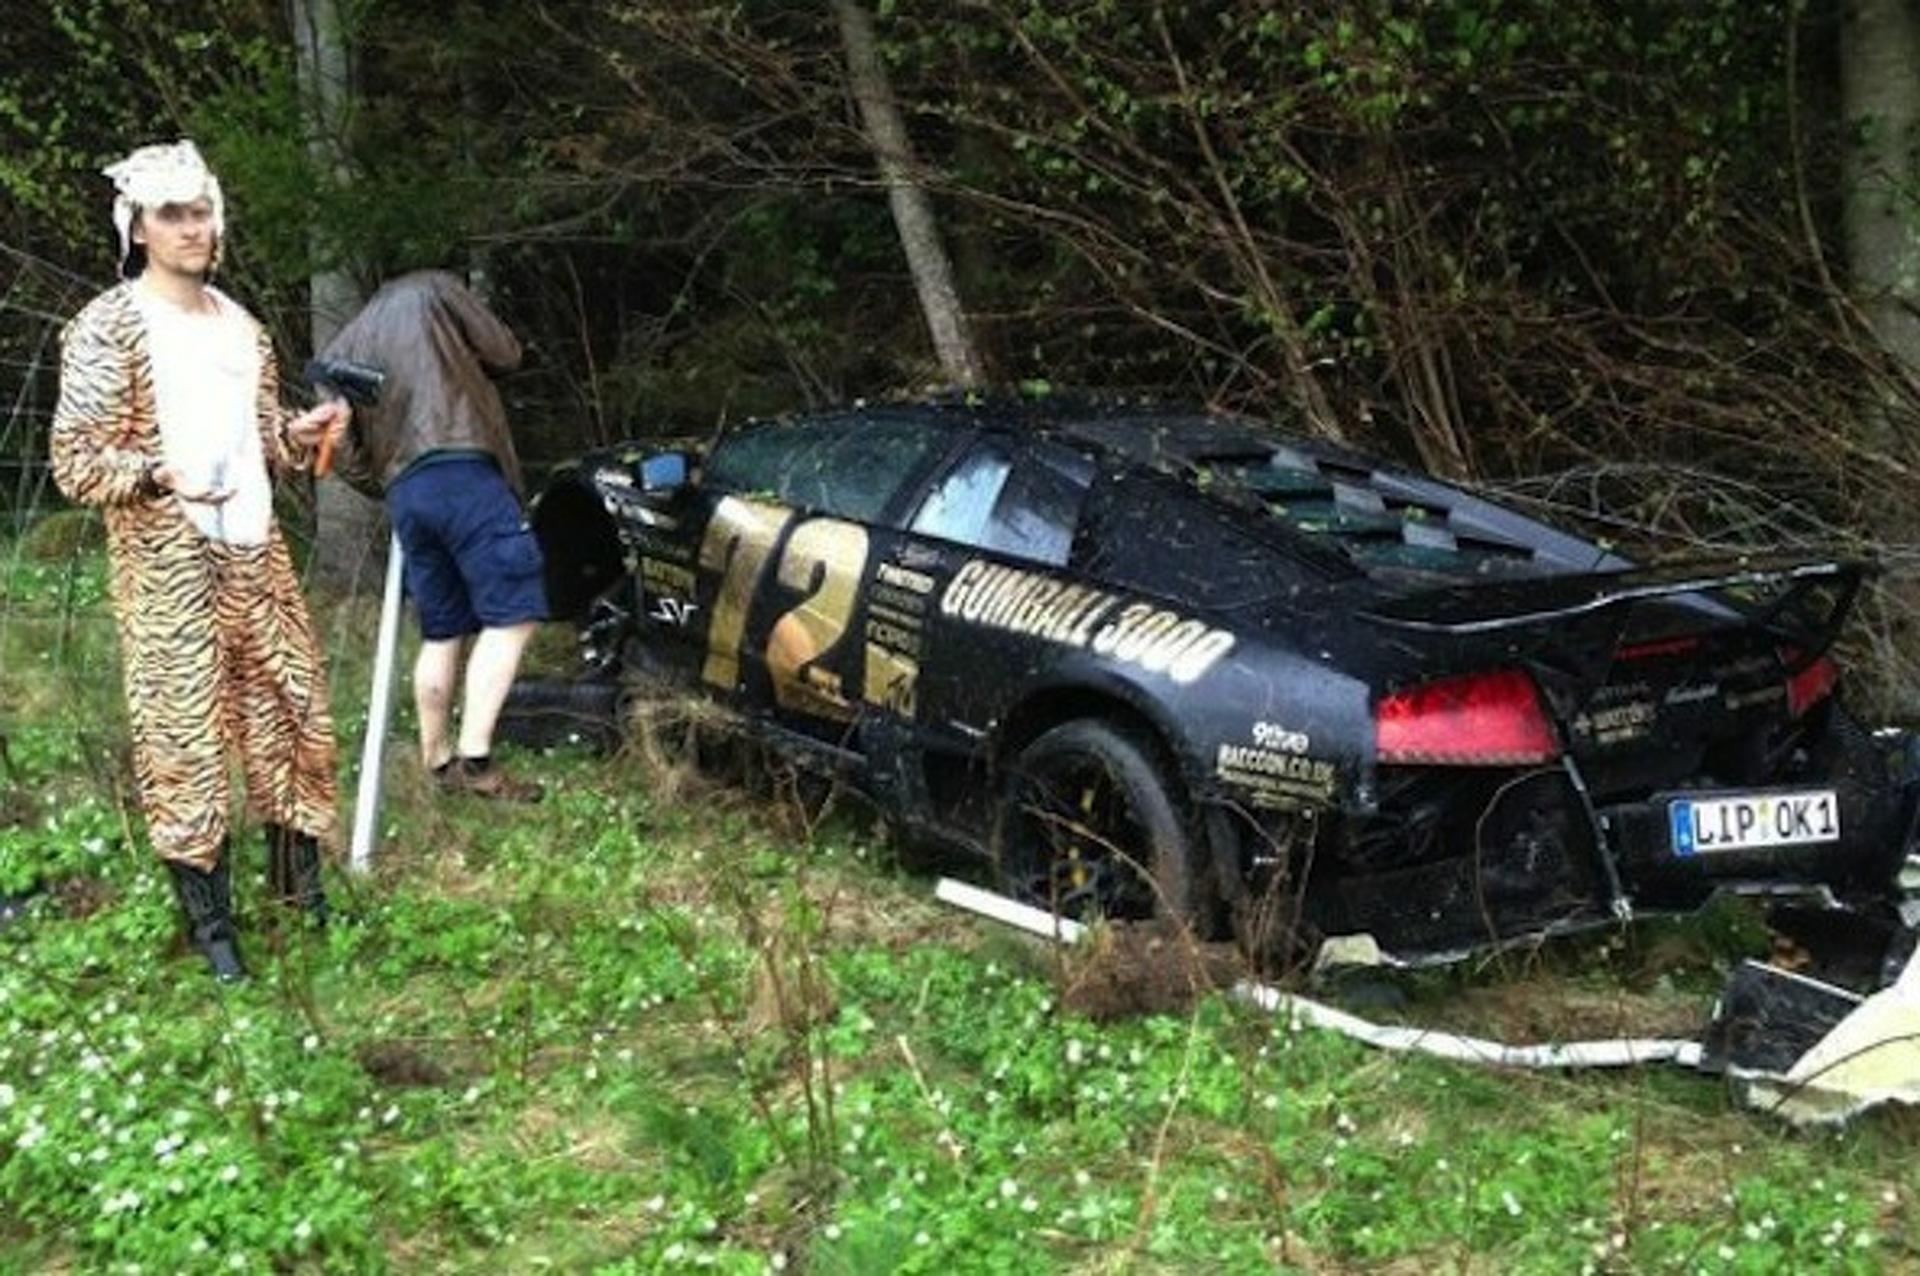 Gumball 3000: Some Tiger Crashed His Lamborghini Murcielago SV